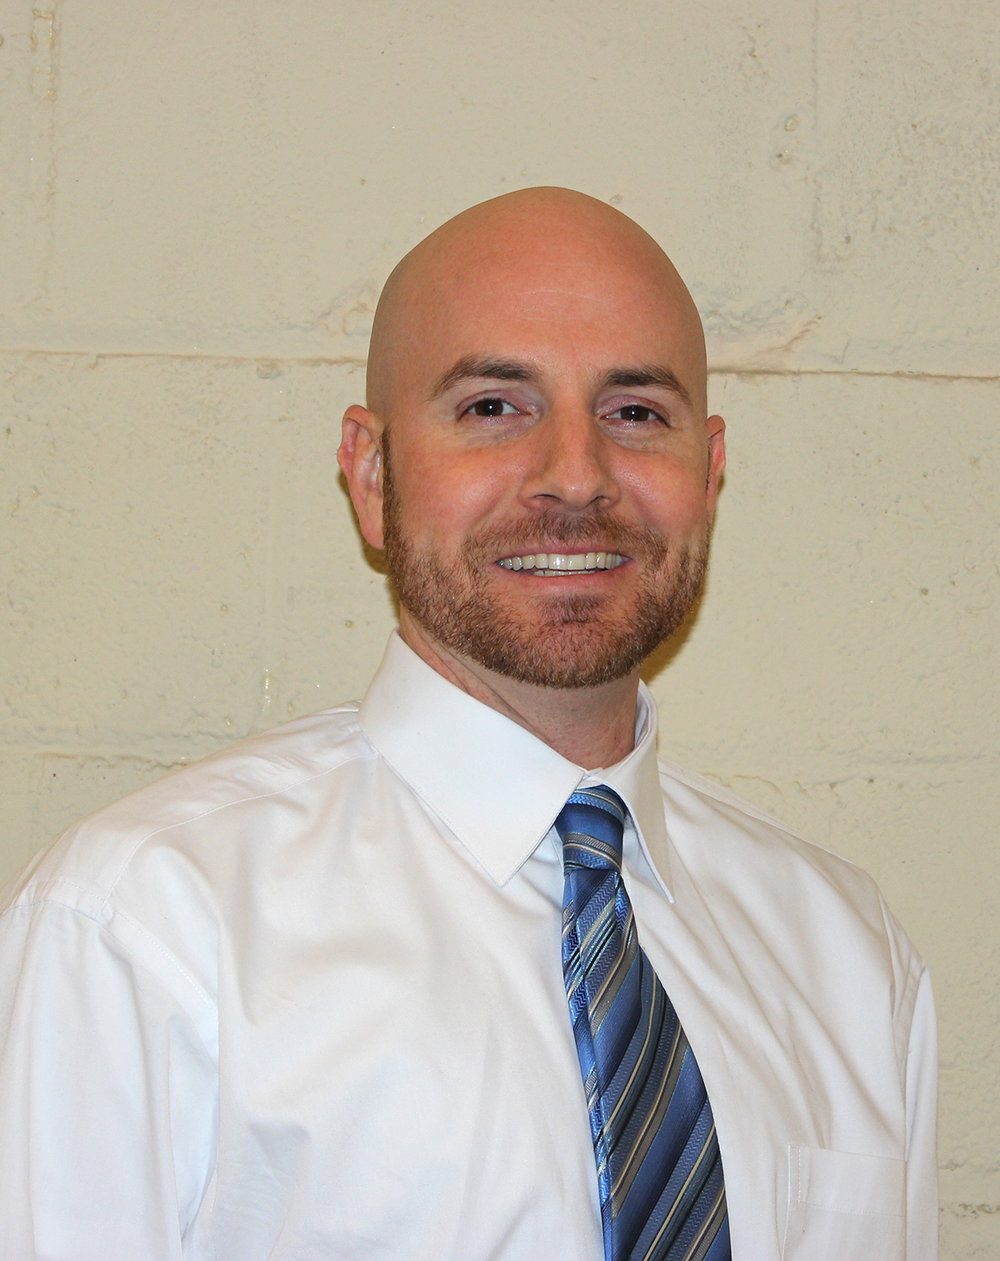 Rob Rock Director of Elections (401) 222-2340  rrock@sos.ri.gov   Website